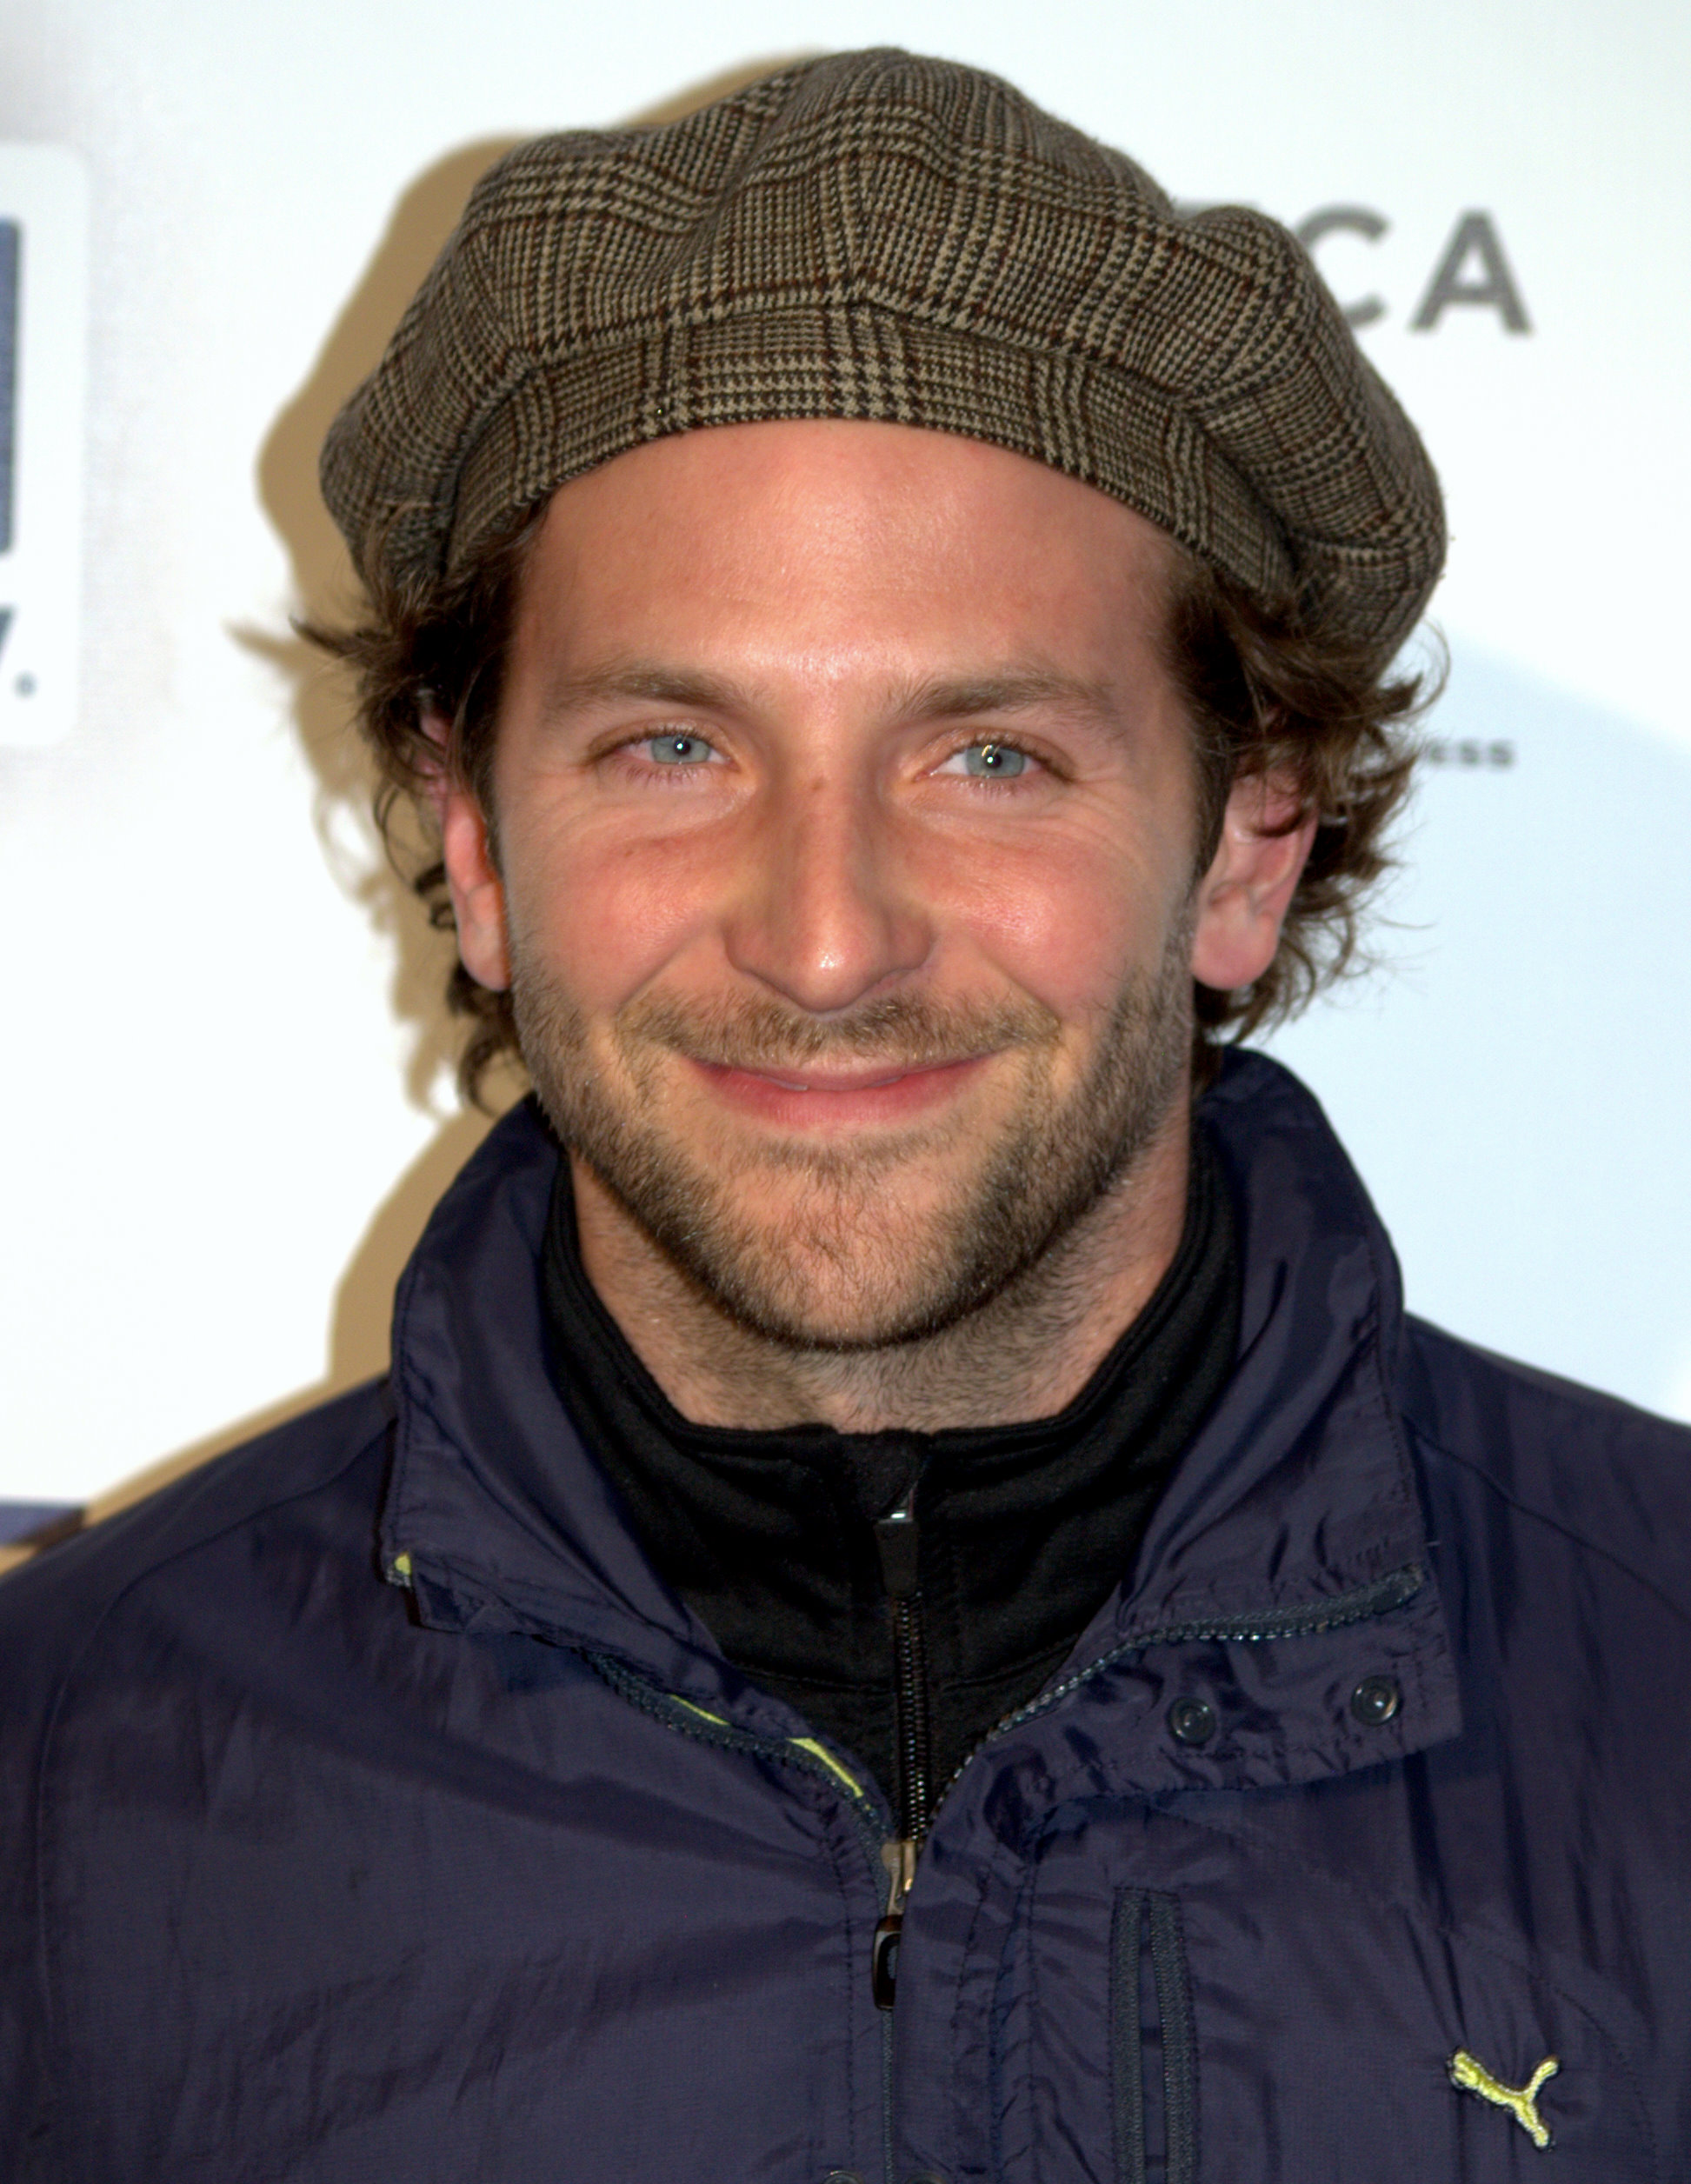 File:Bradley Cooper 2009.jpg - Wikimedia Commons Bradley Cooper